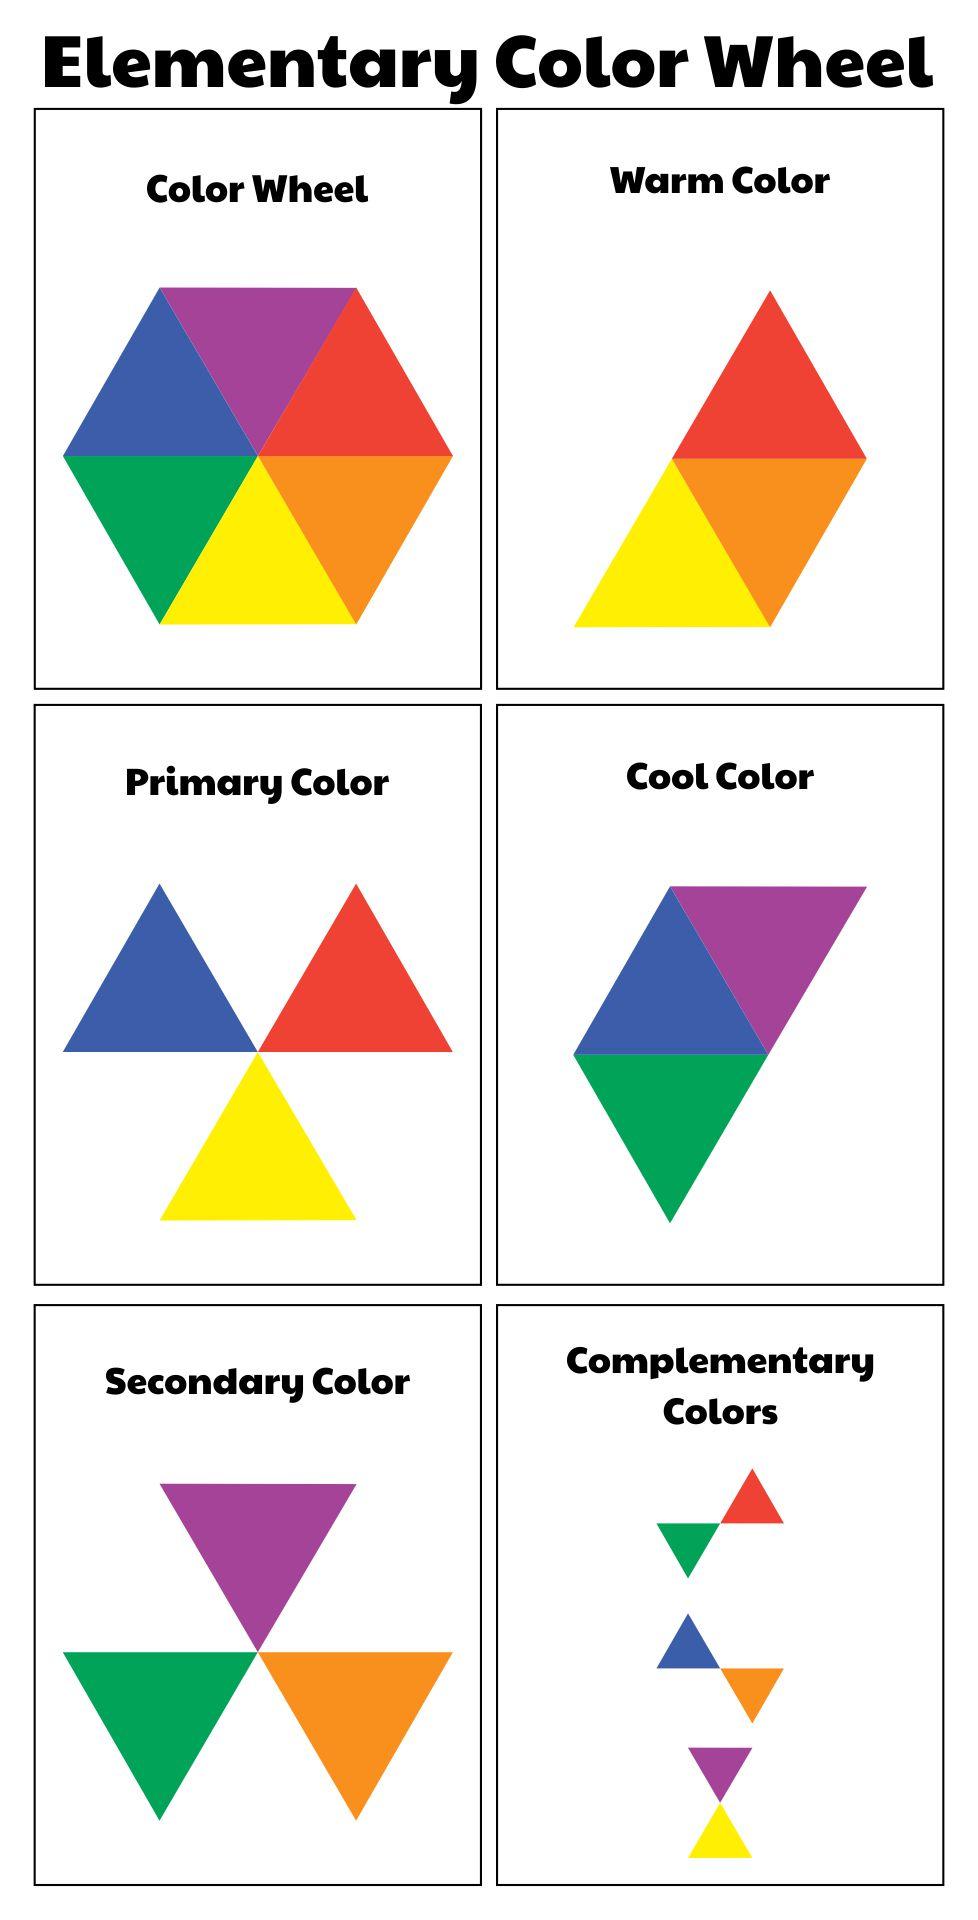 Elementary Color Wheel